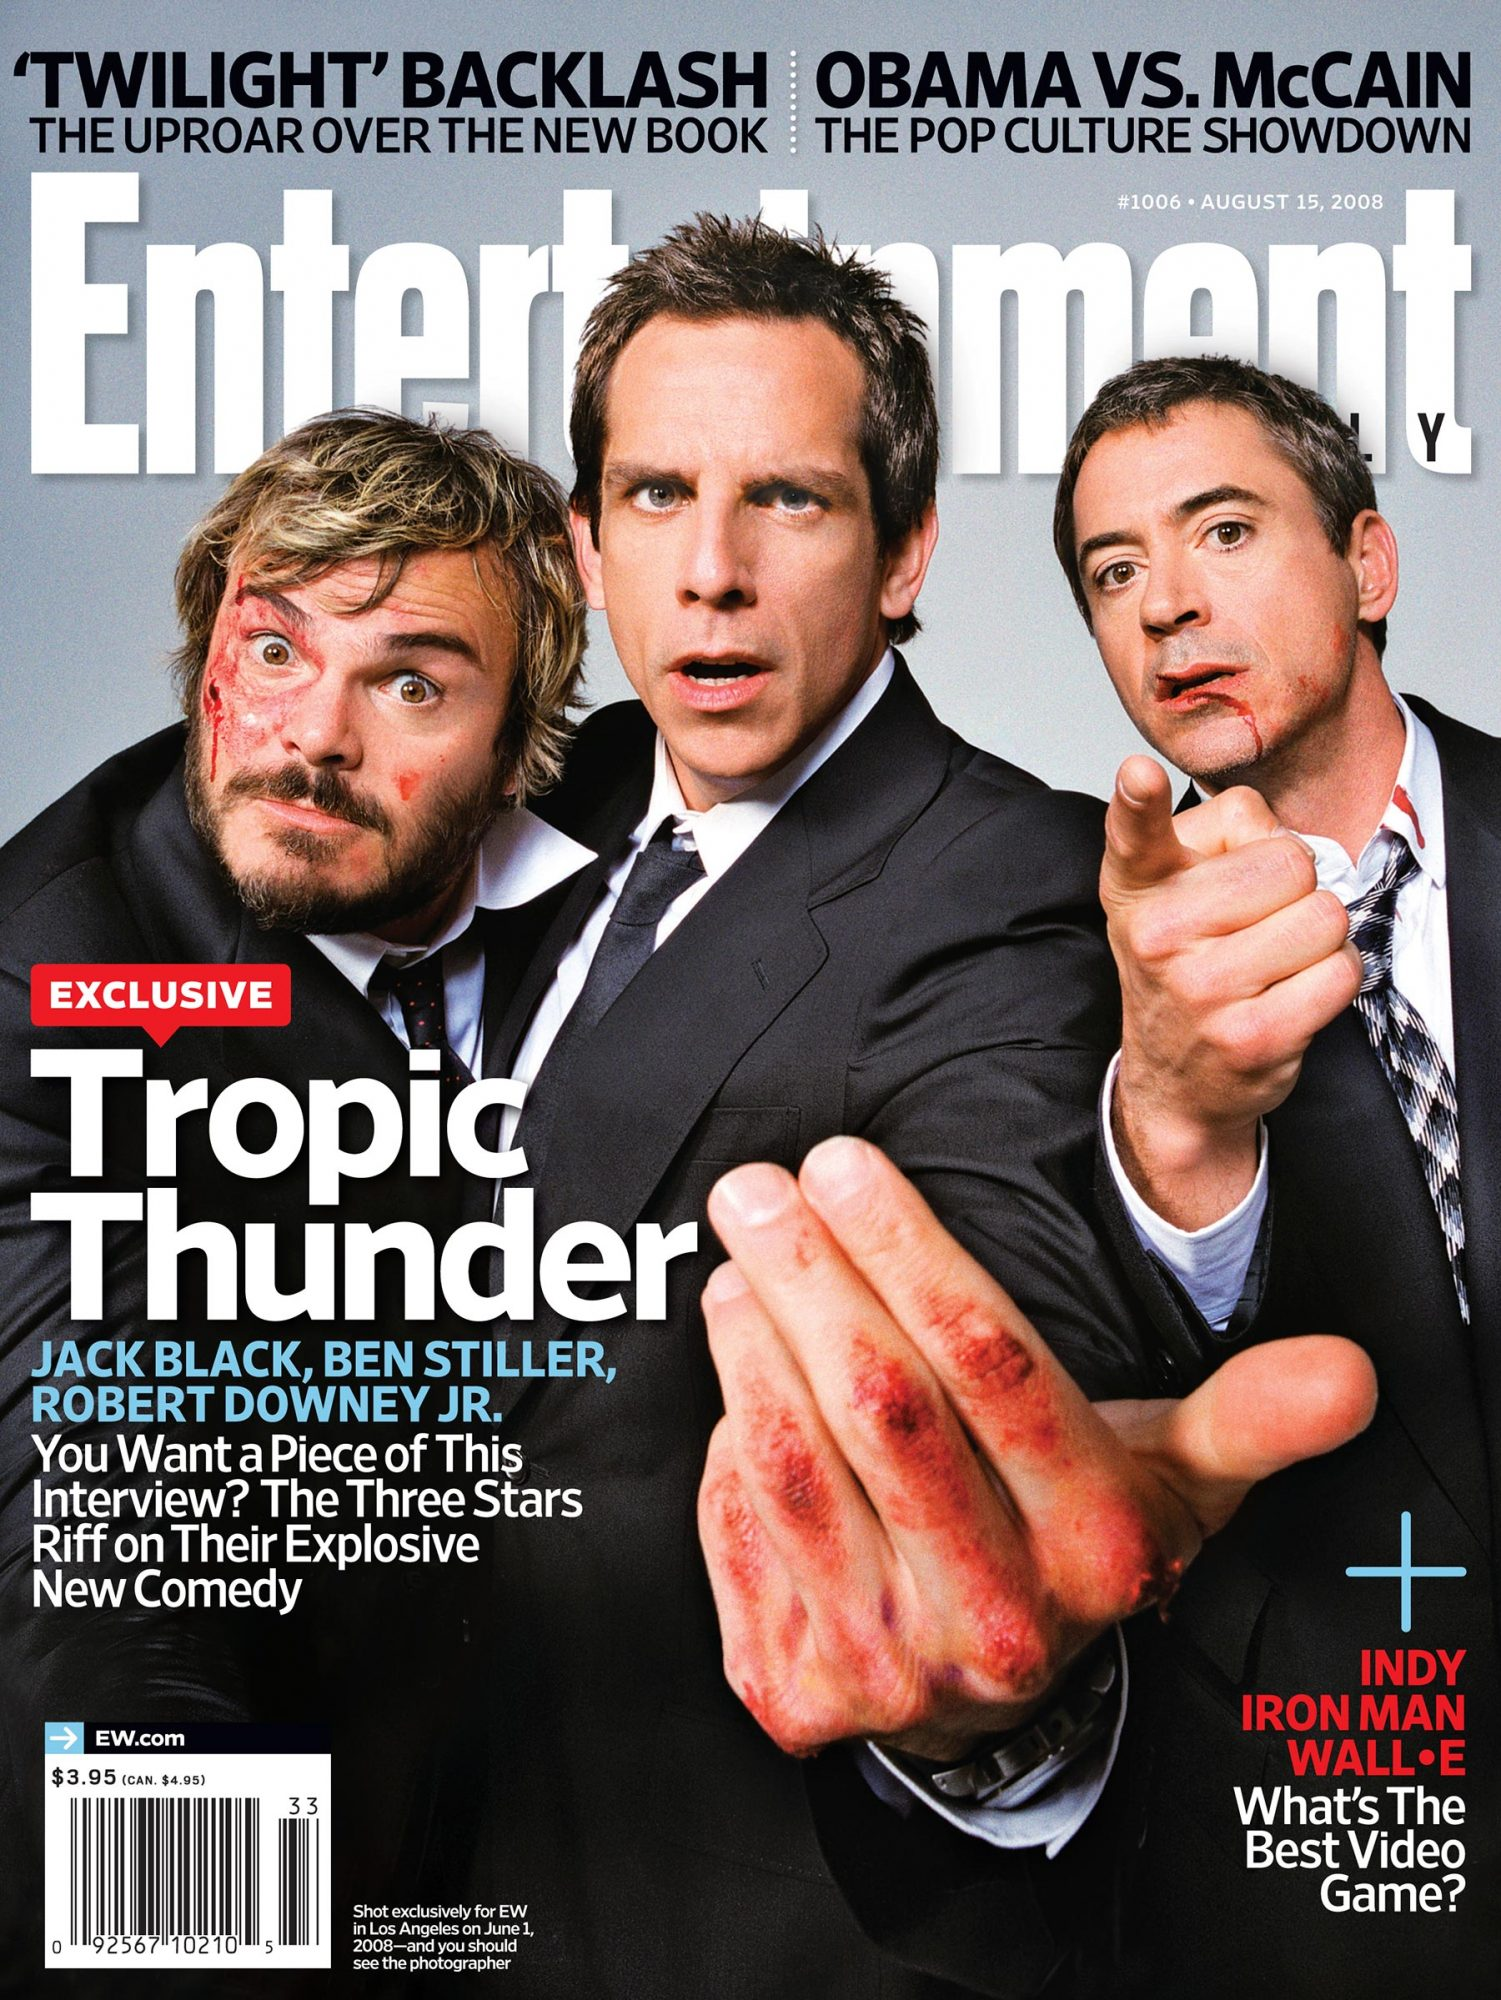 Entertainment WeeklyTropic ThunderAugust 15, 20081006